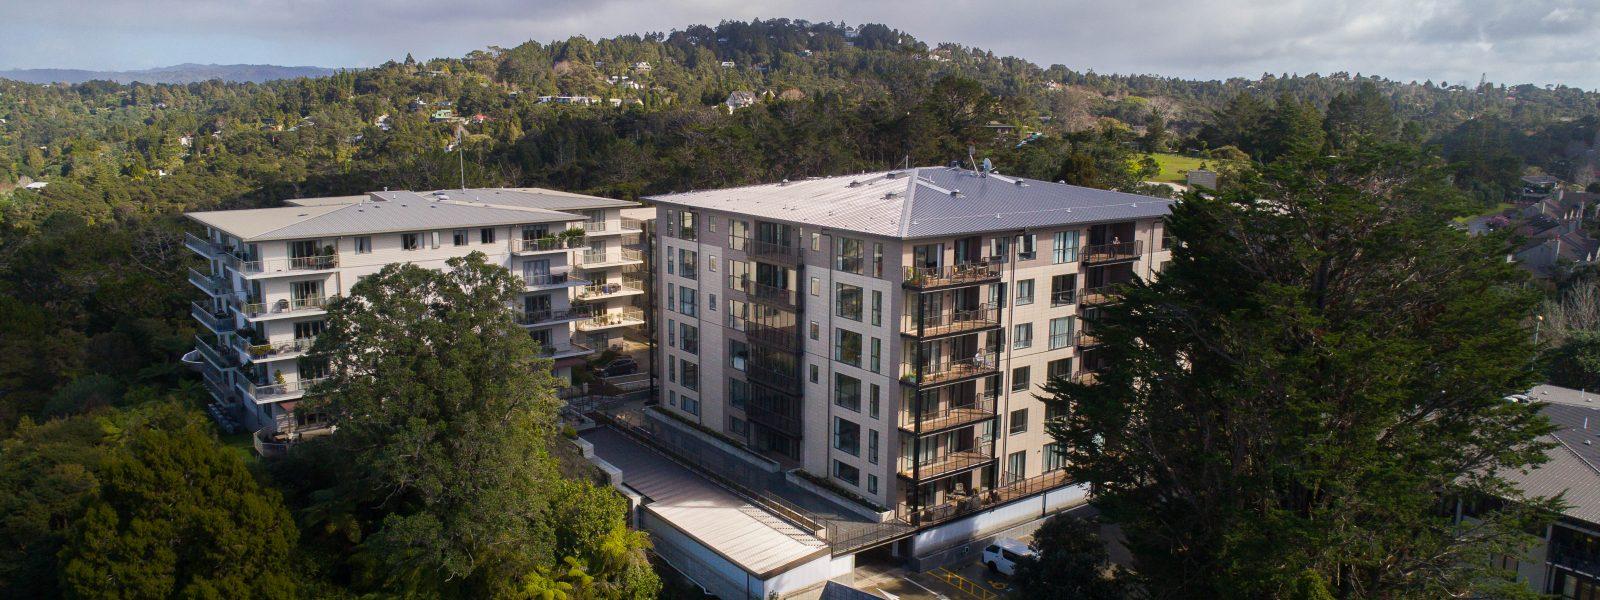 Metlifecare Pinesong Village Manukau Building 1